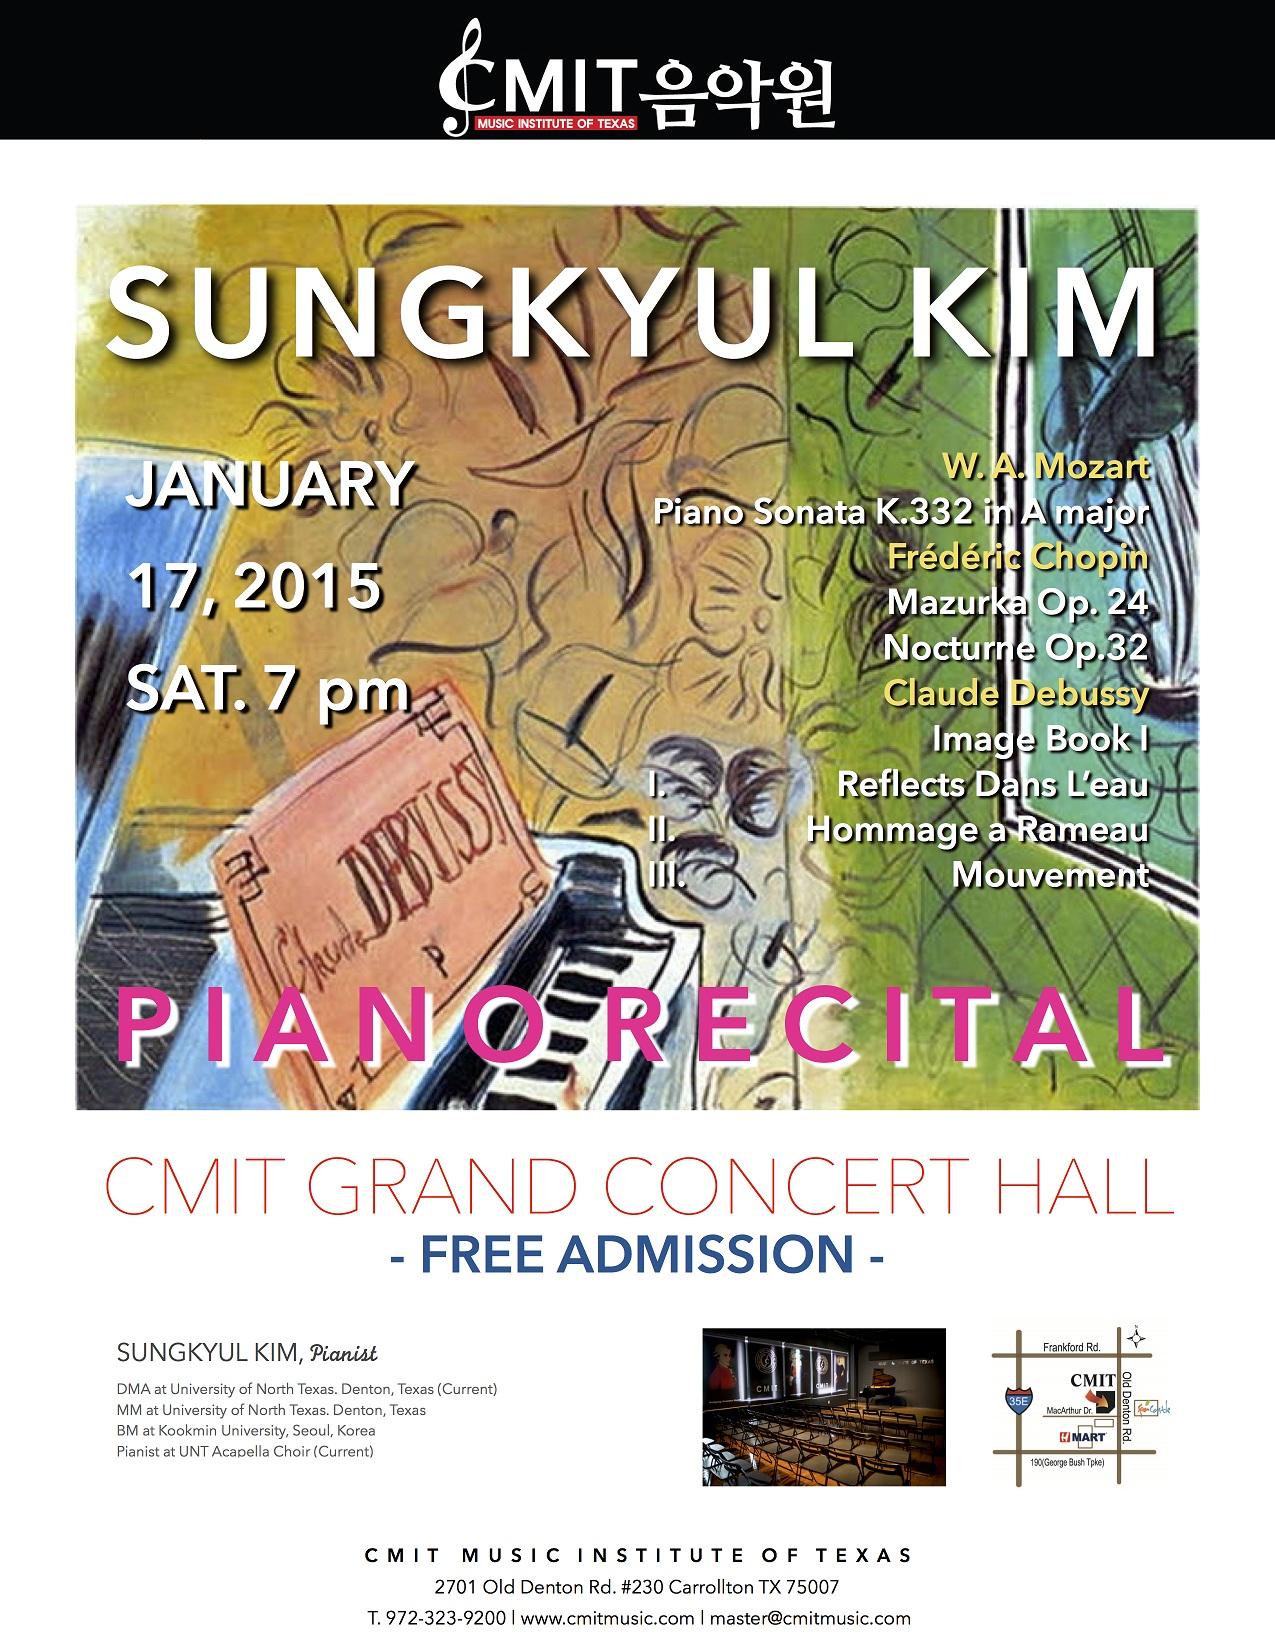 Sungkyul Kim - PIANO RECITAL 011715 s.jpg